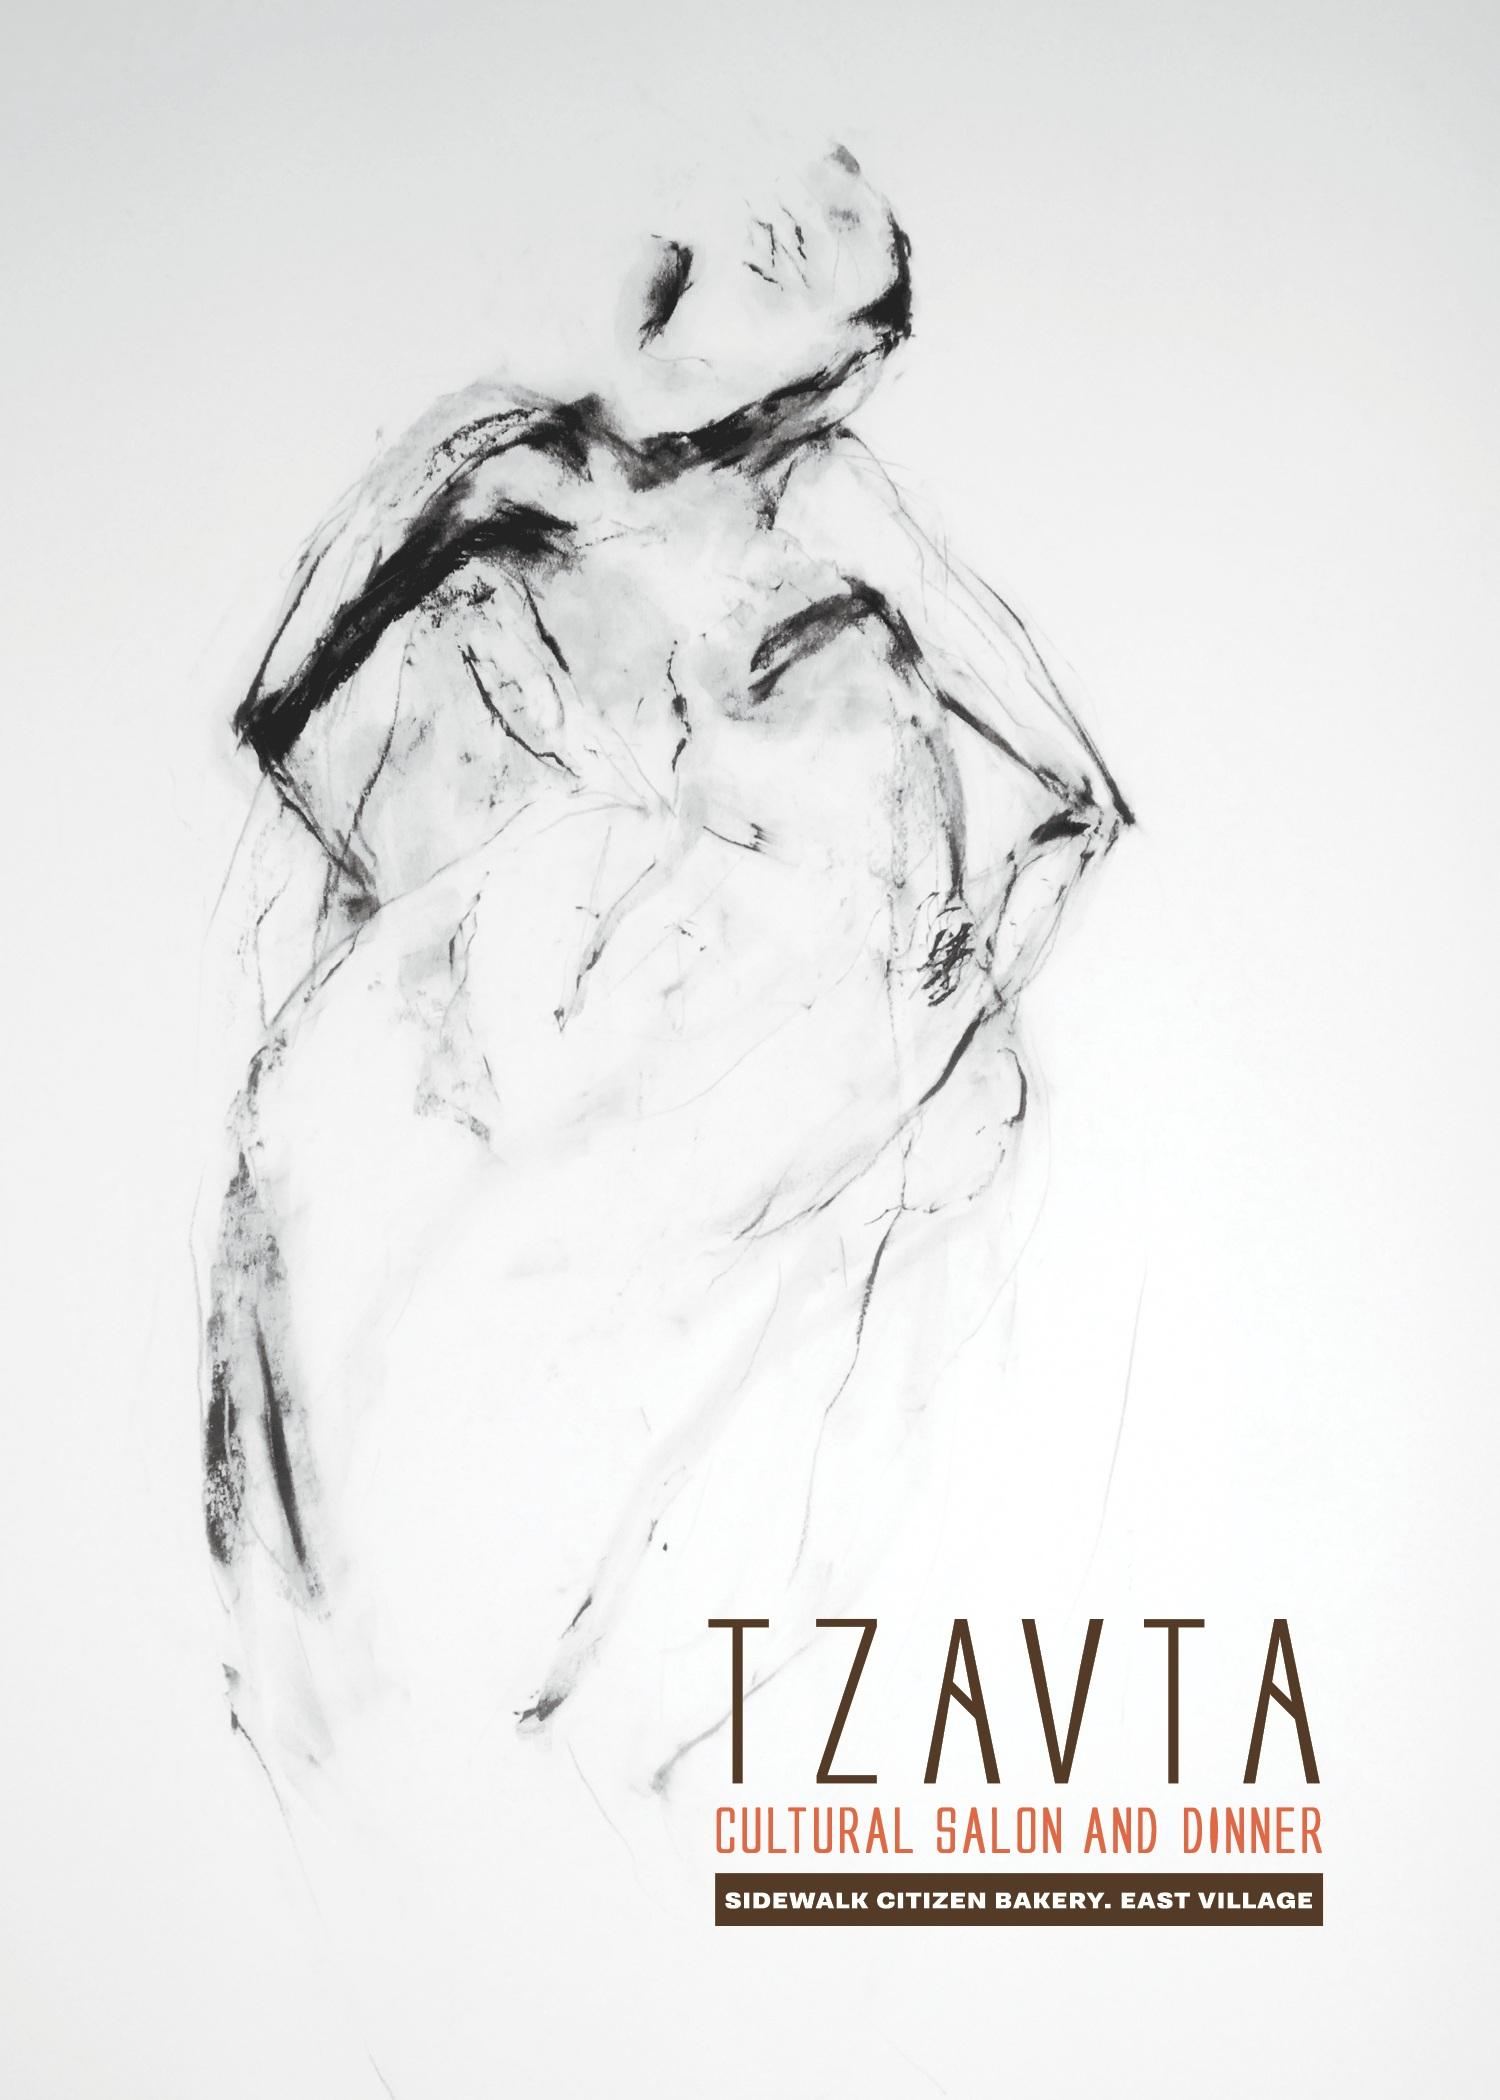 TZAVTA #2